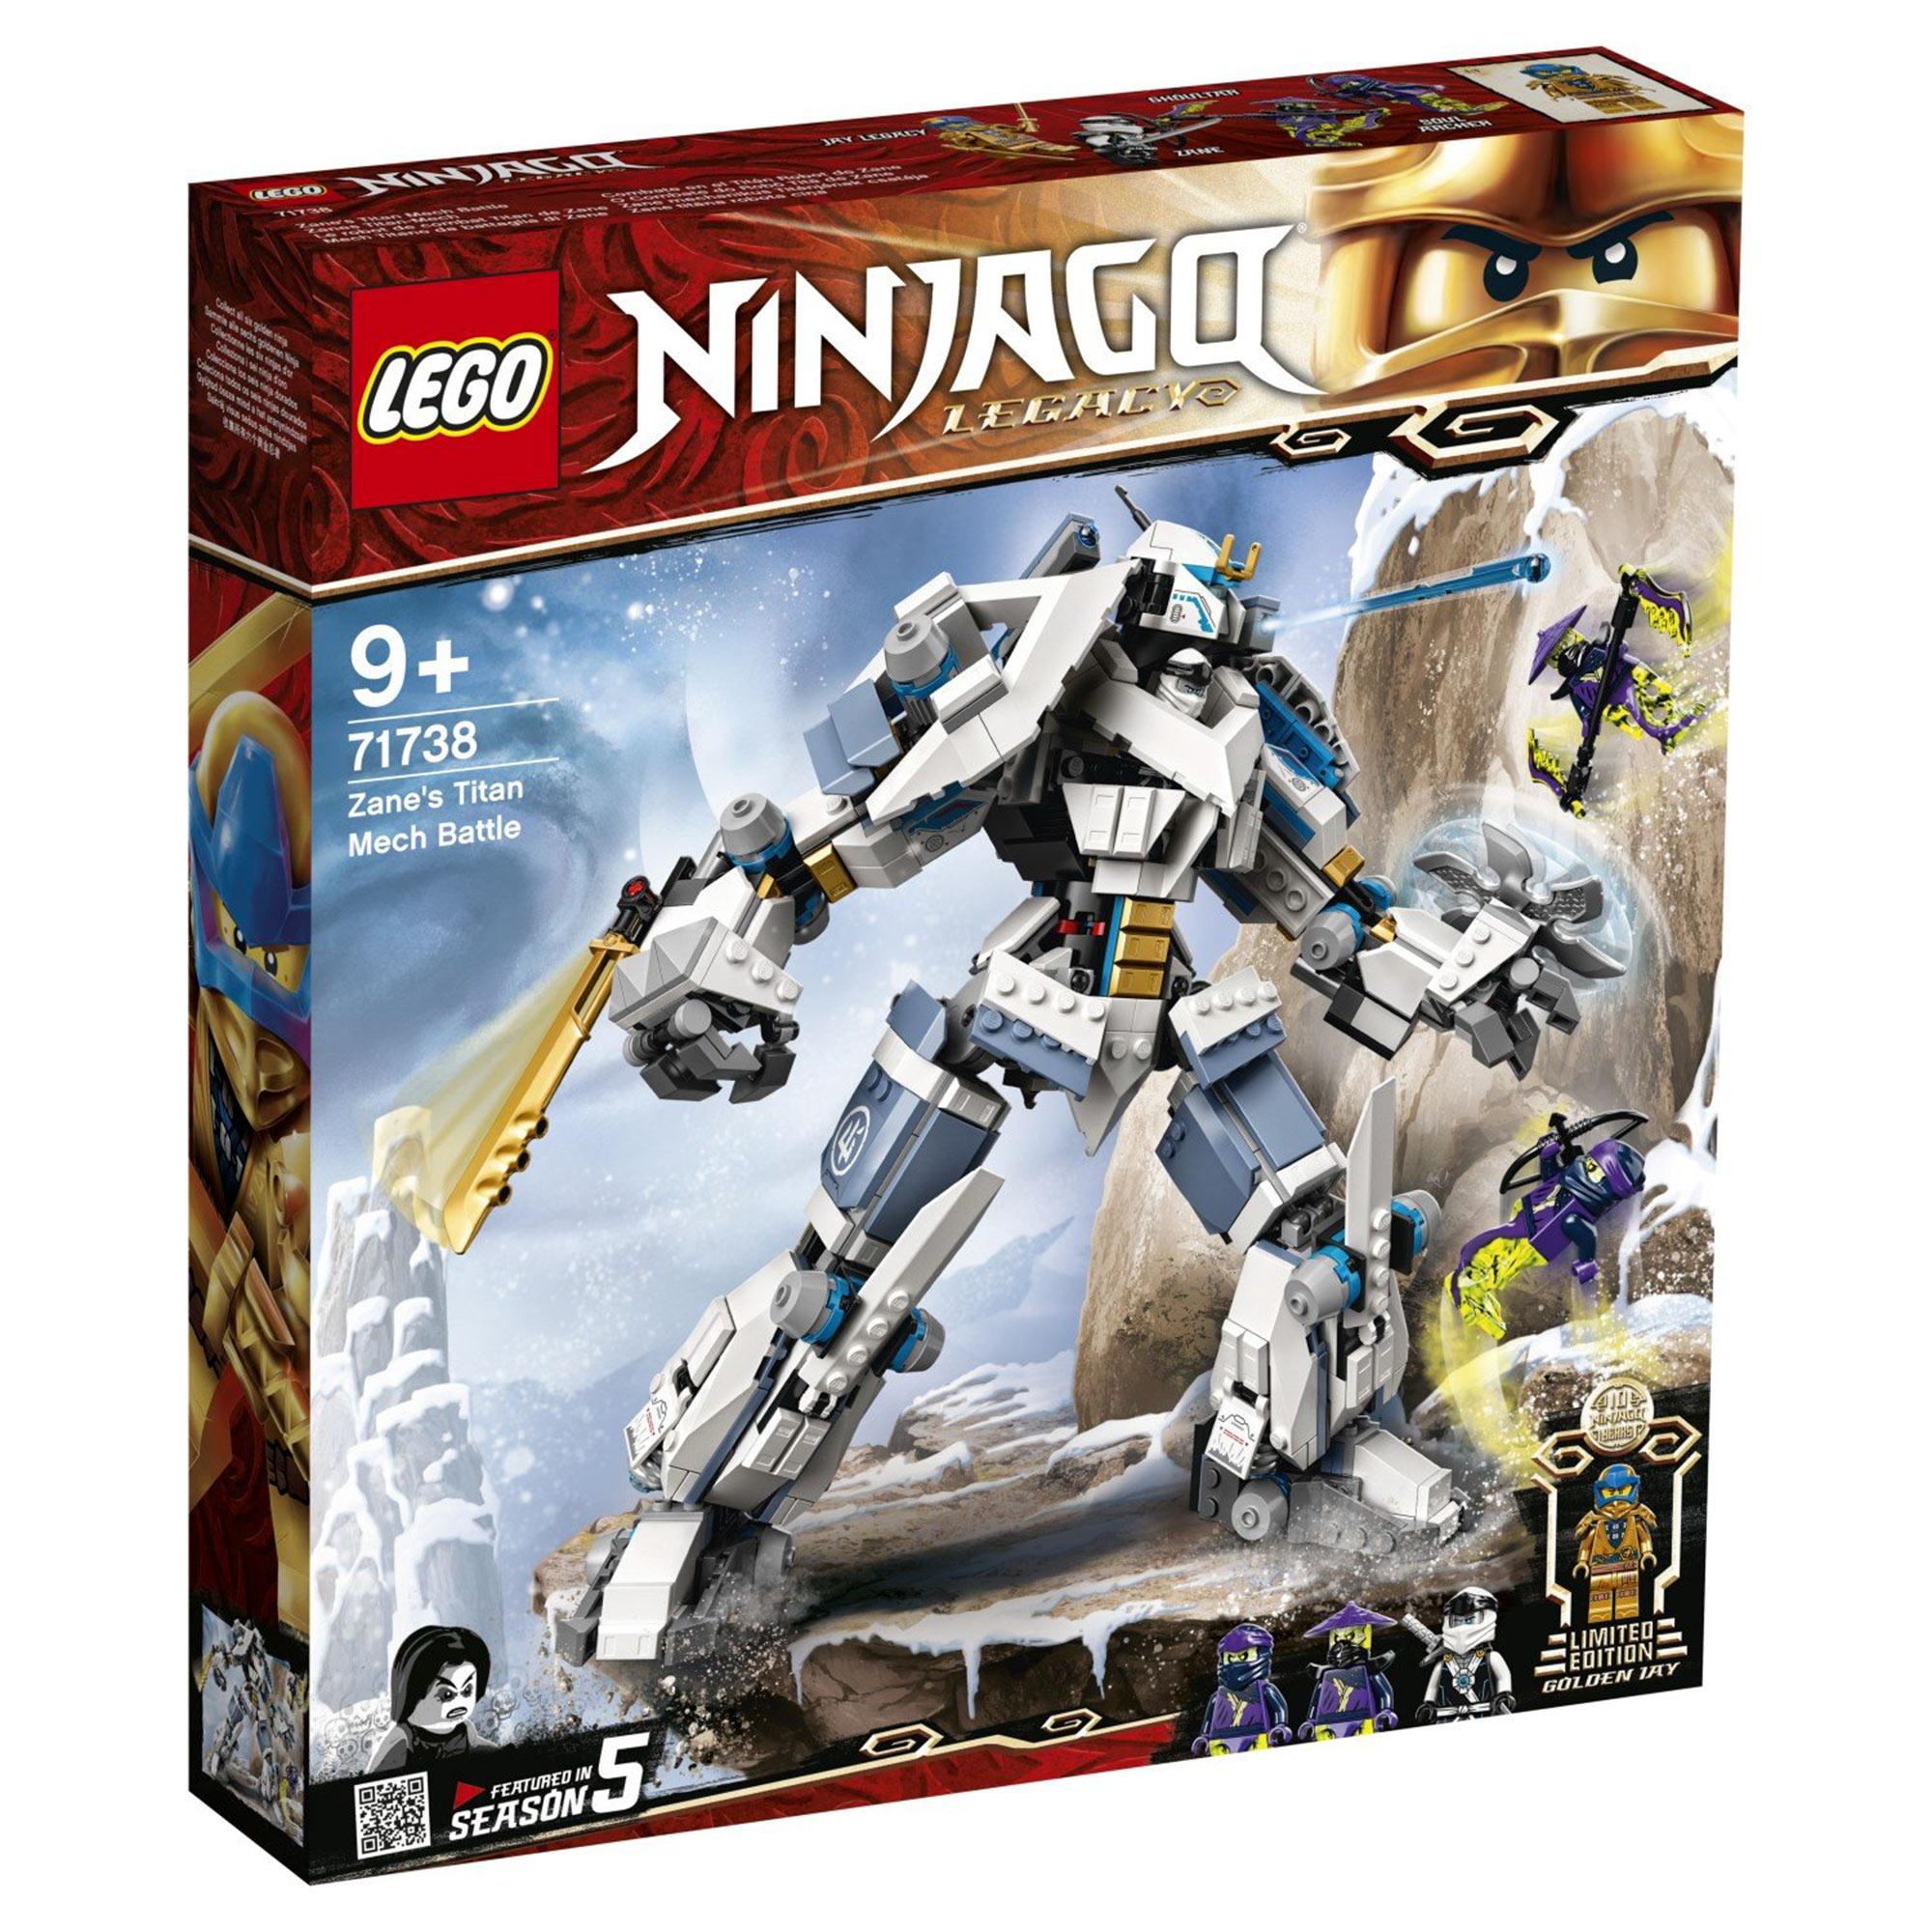 Фото - Конструктор Lego Ninjago Битва с роботом Зейна 71738 конструктор lego ninjago бронированный носорог зейна